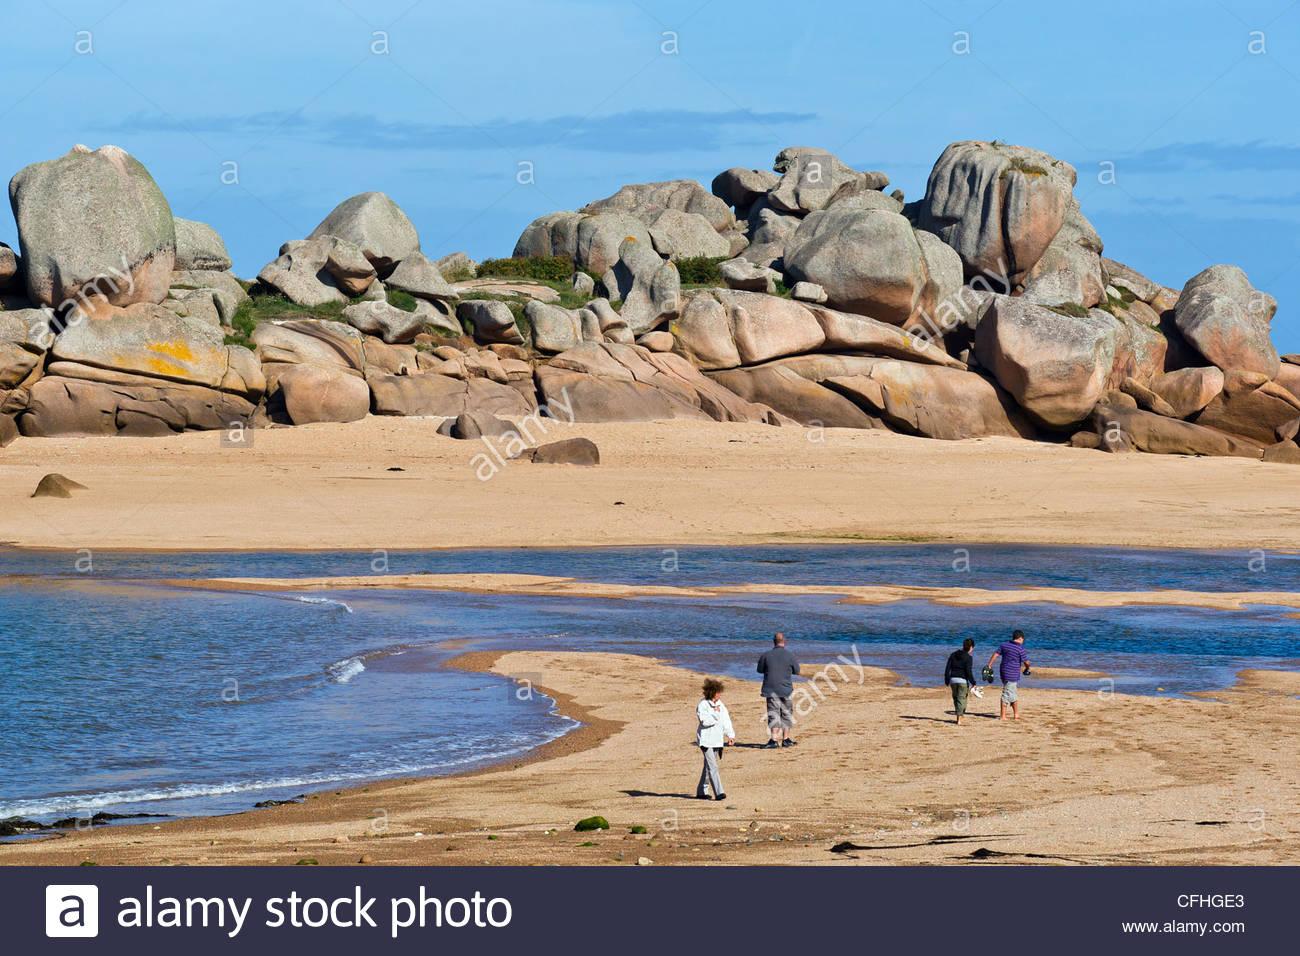 Tregastel (near Perros Guirec) : Presqu'île Renote on the Pink granite coast - Brittany - France Stock Photo